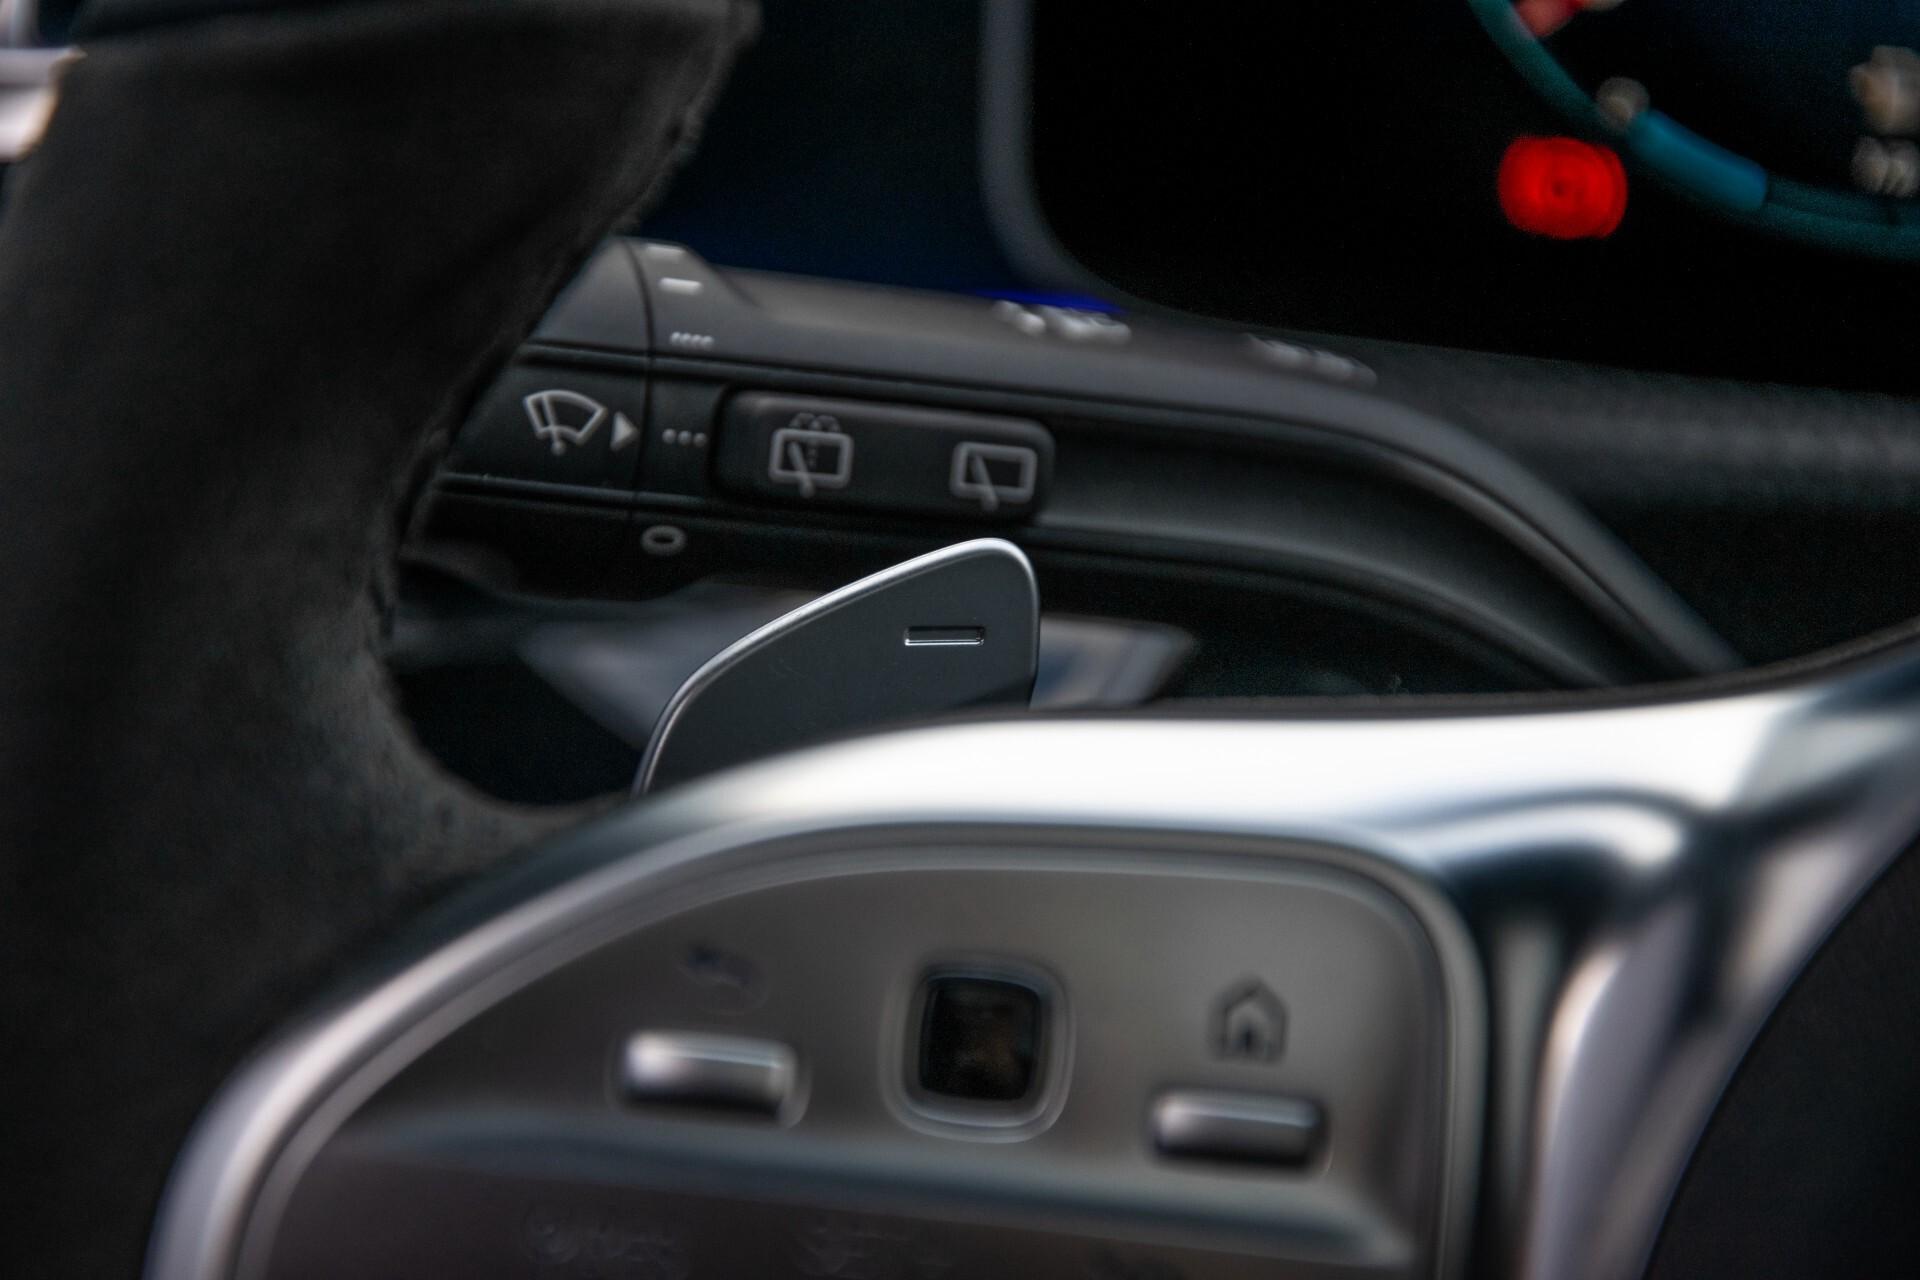 Mercedes-Benz A-Klasse 250 4-M AMG Panorama/Keyless-Entry/MBUX/HUD/Burmester/360/Multibeam LED Aut7 Foto 12